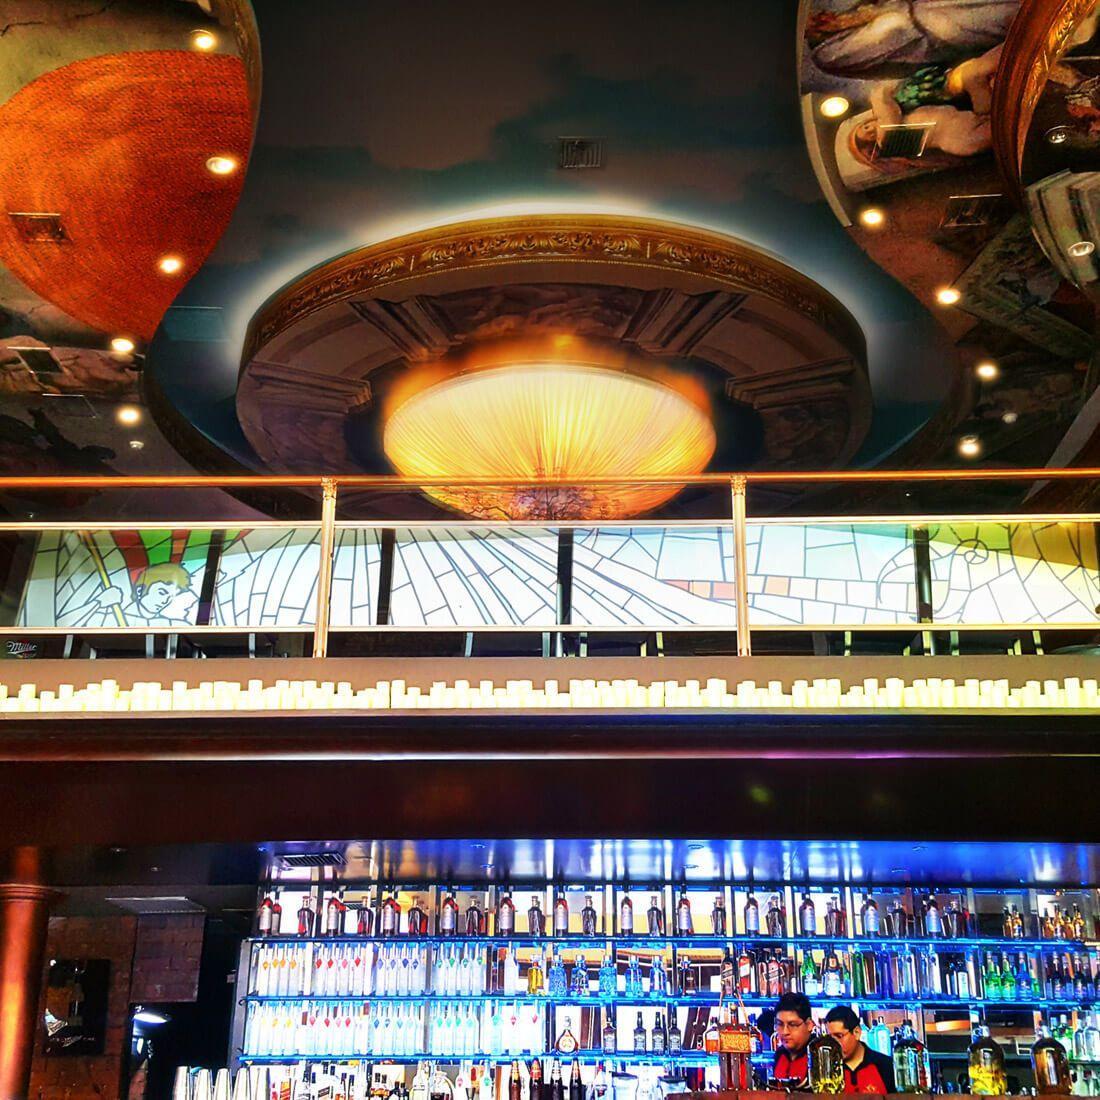 LA BASILICA 640 Restaurant - and Peruvian Food FUSION - SANTIAGO DE SURCO - MESA 24/7 Guide | LIMA - Peru